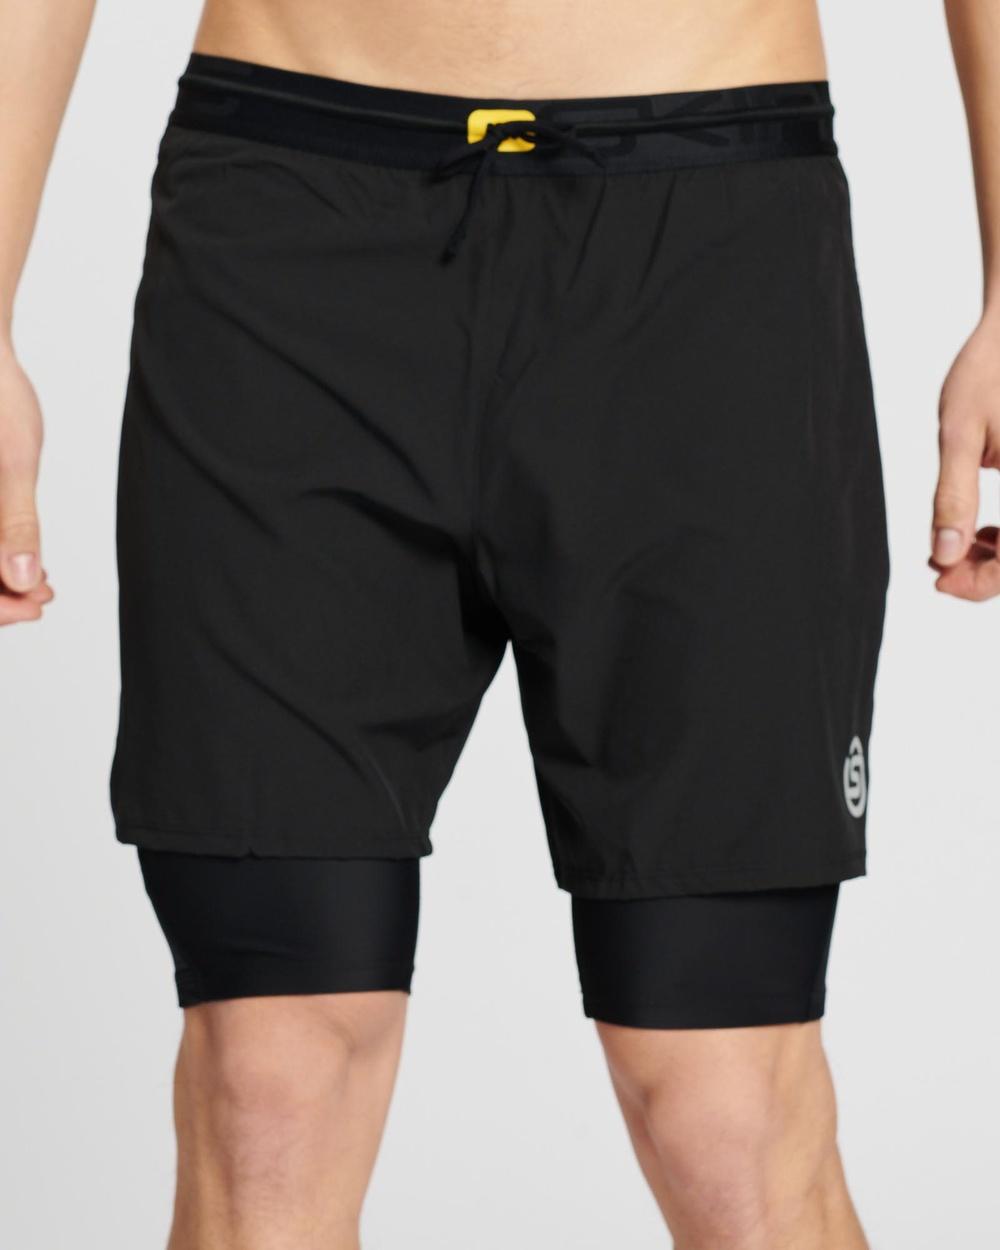 Skins 3 Series Men's Superpose Half Tights Compression Black 3-Series